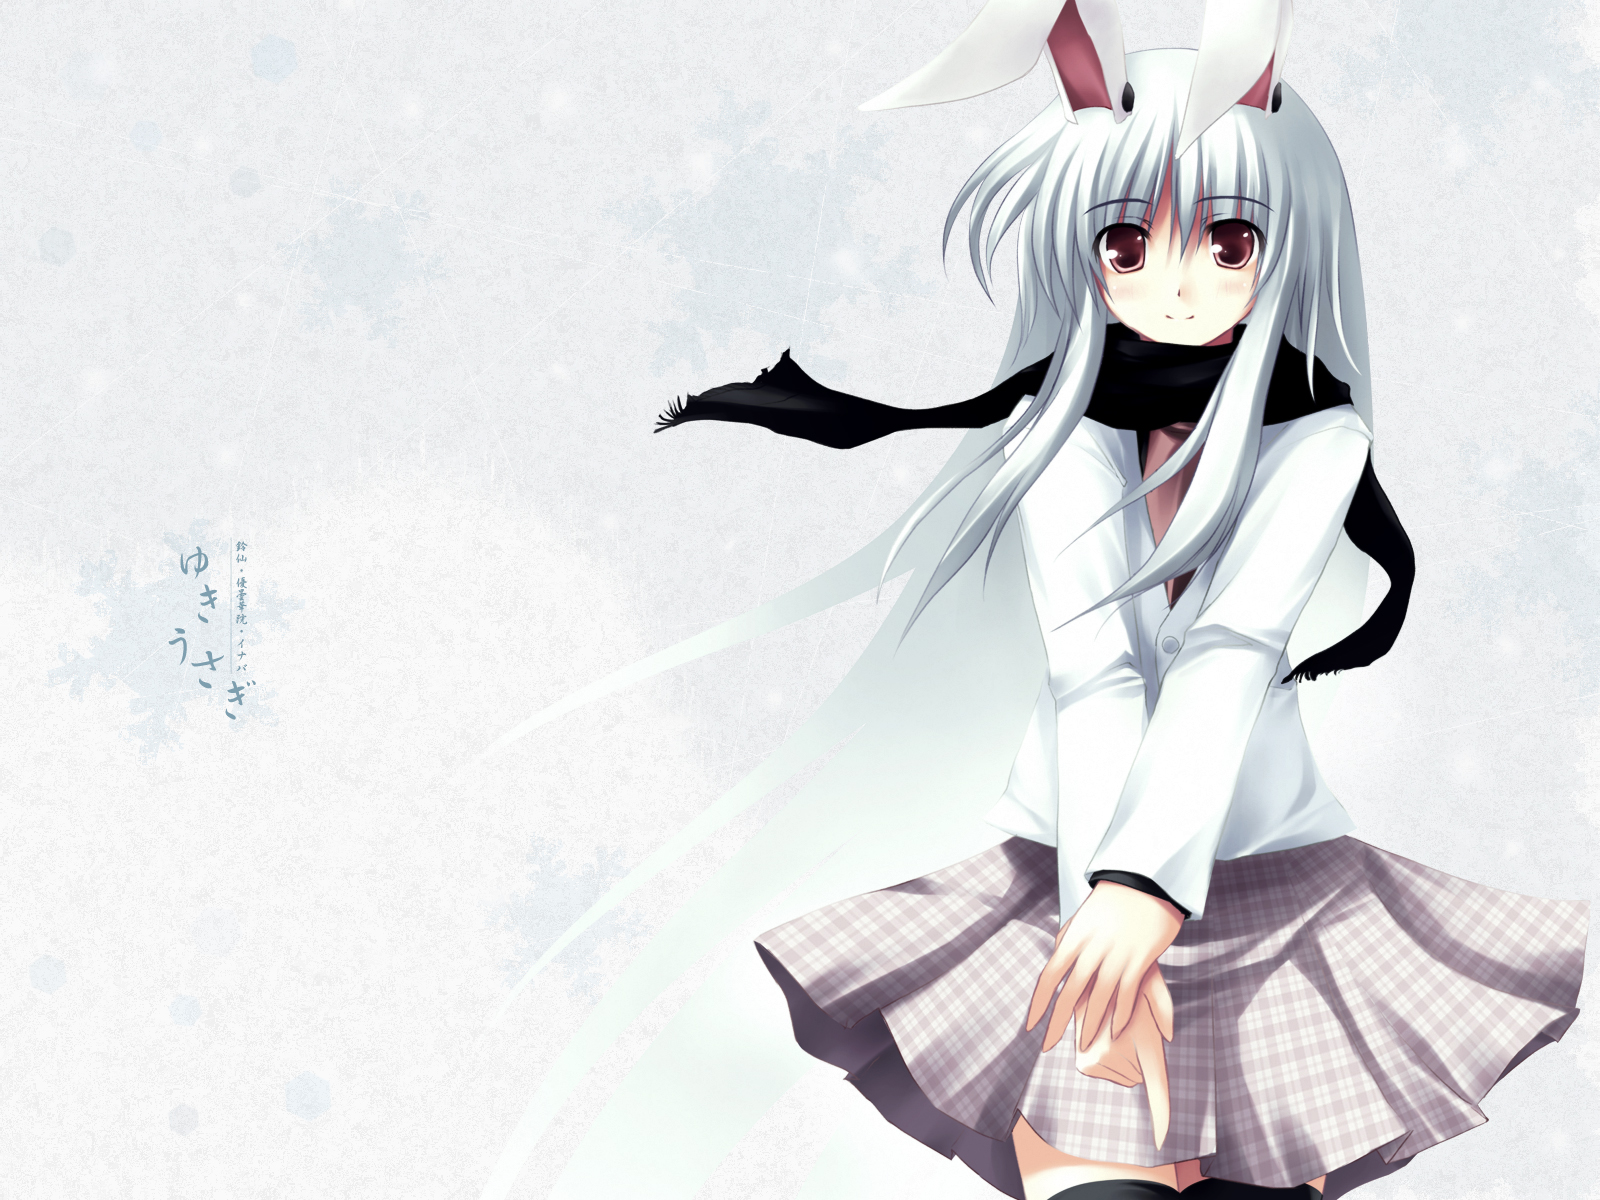 Anime - Flicka  Bakgrund